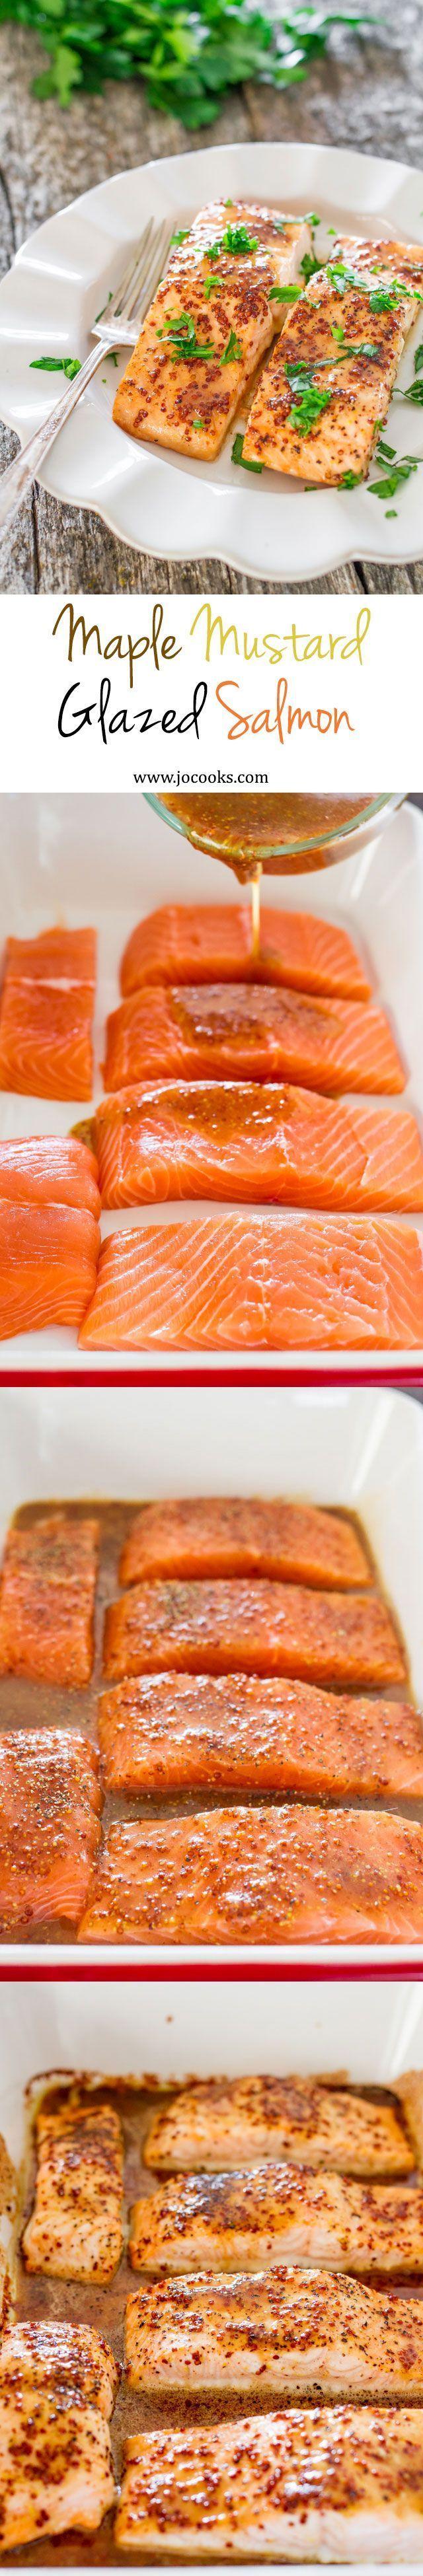 Maple Mustard Glazed Salmon - so good!